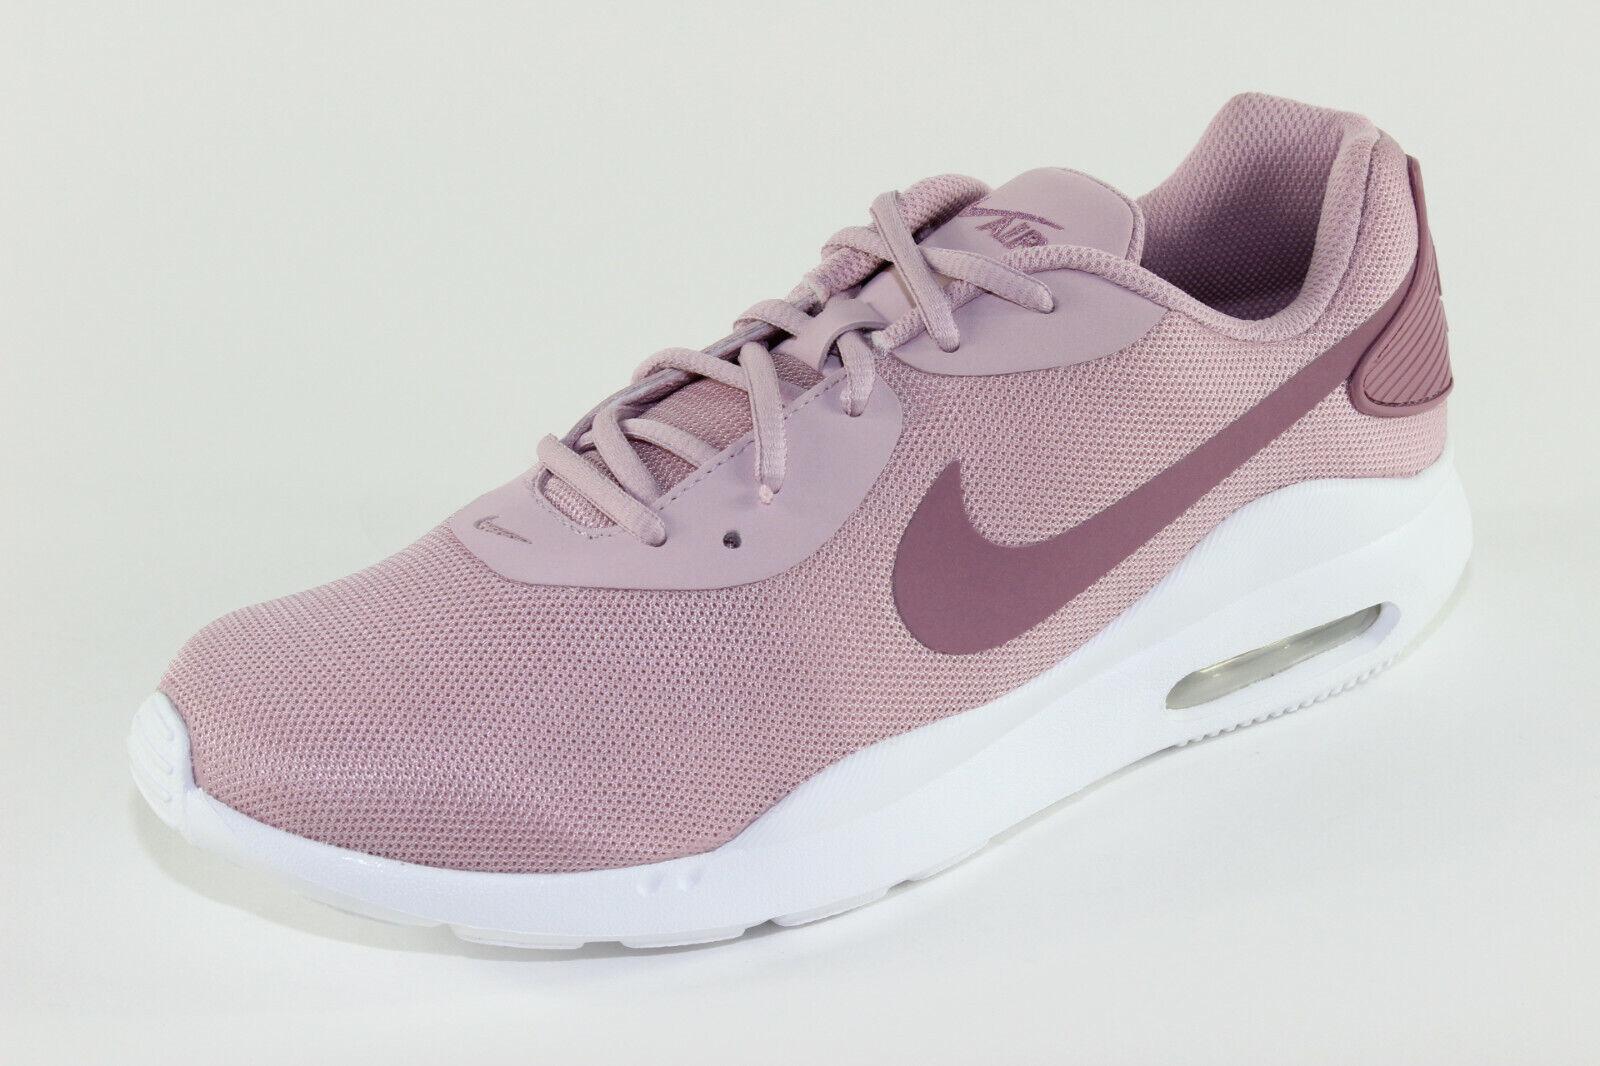 Nike Air Max Oketo WMNS, sportliche Turnschuhe, Damenschuhe Übergröße